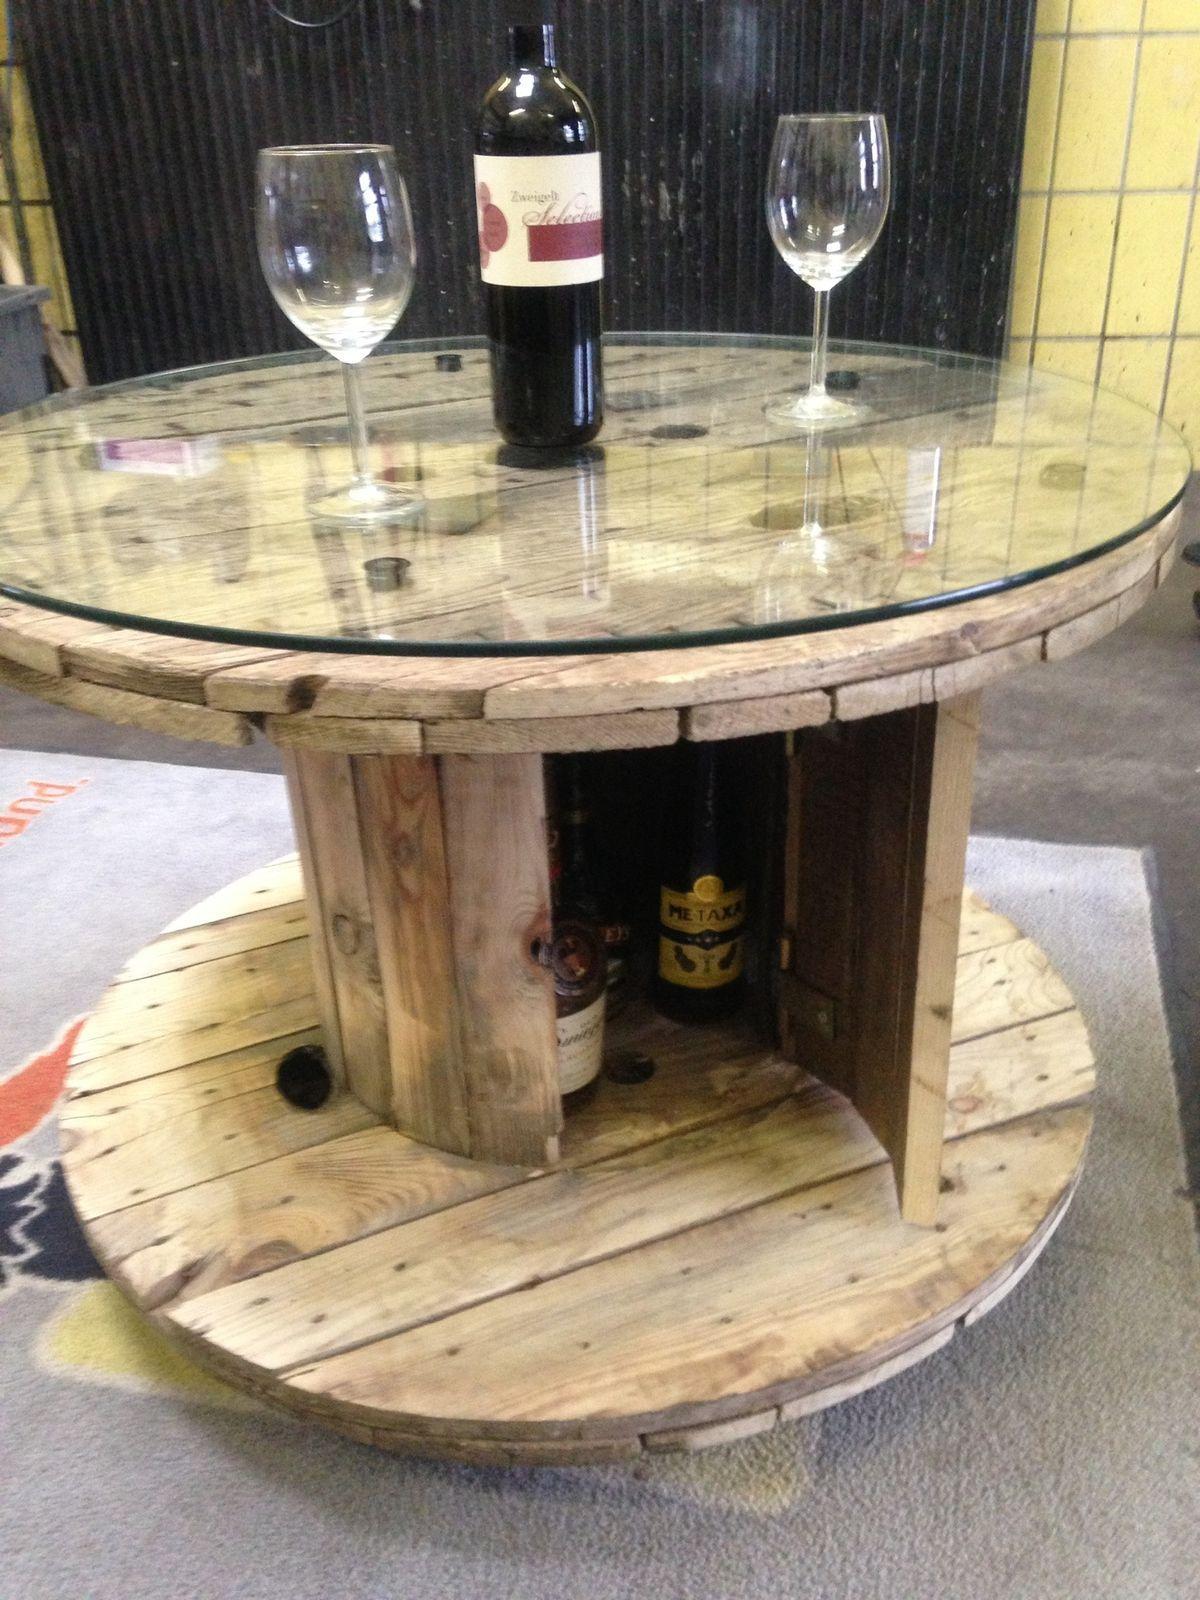 kabeltrommel tisch tr delmarkt pinterest inredning. Black Bedroom Furniture Sets. Home Design Ideas